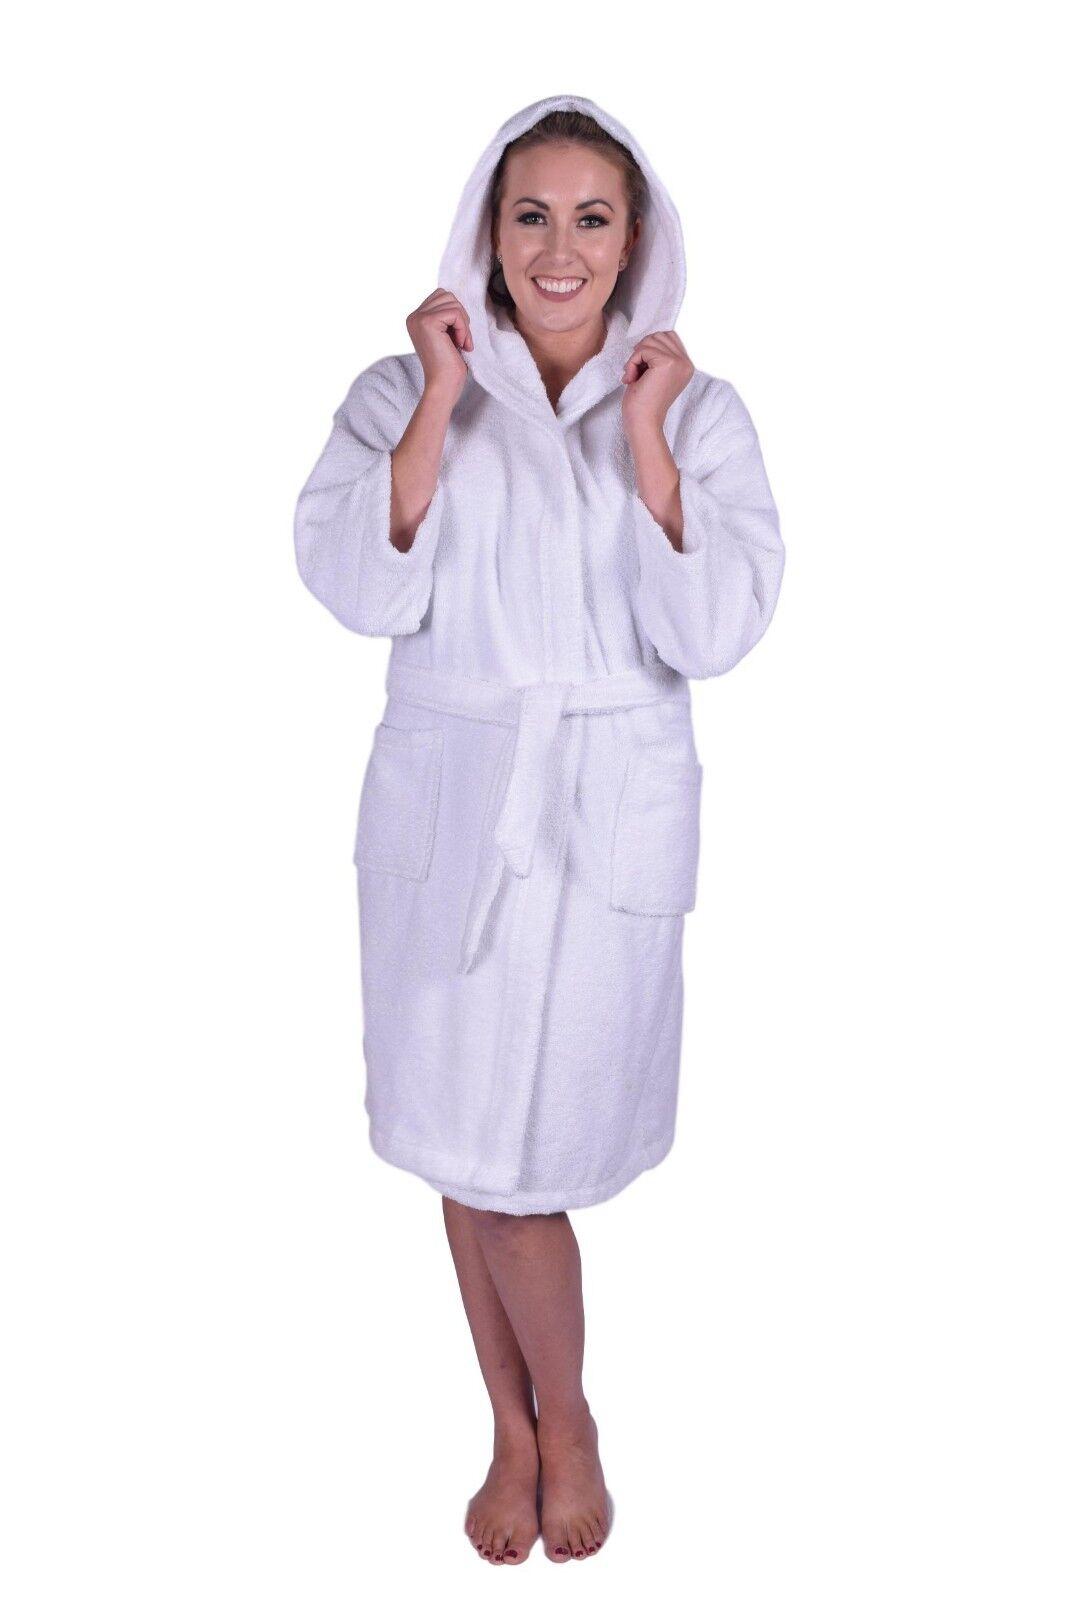 Puffy Cotton Teen   Petite Unisex Unisex Unisex Hoodie Bathrobe 100% Natural Soft Cotton Robe 79d221